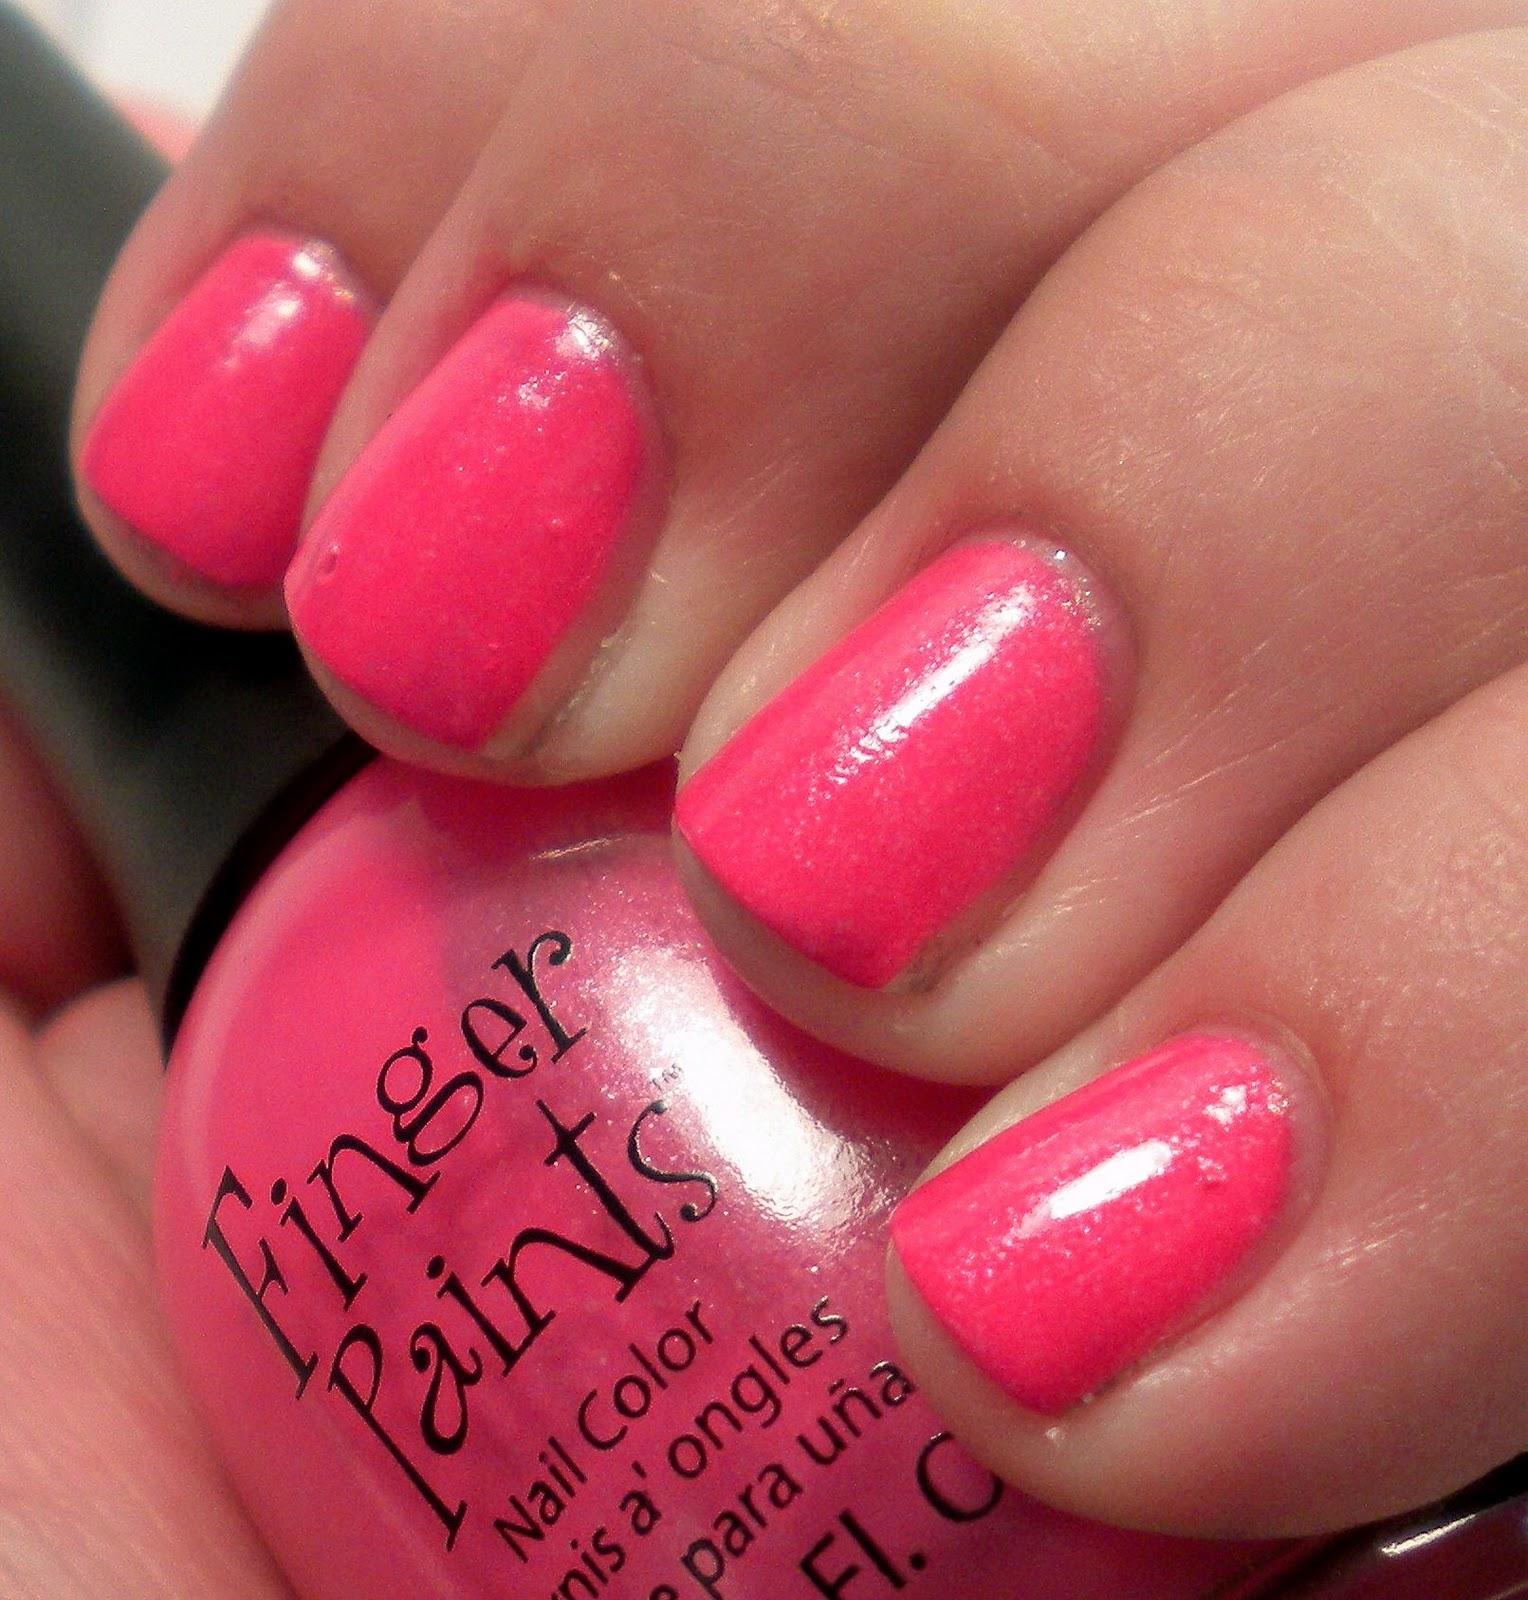 Nail Polish On Pinky Finger Meaning: Nail Polish Addiction Anonymous: Finger Paints BCA Nail Polish